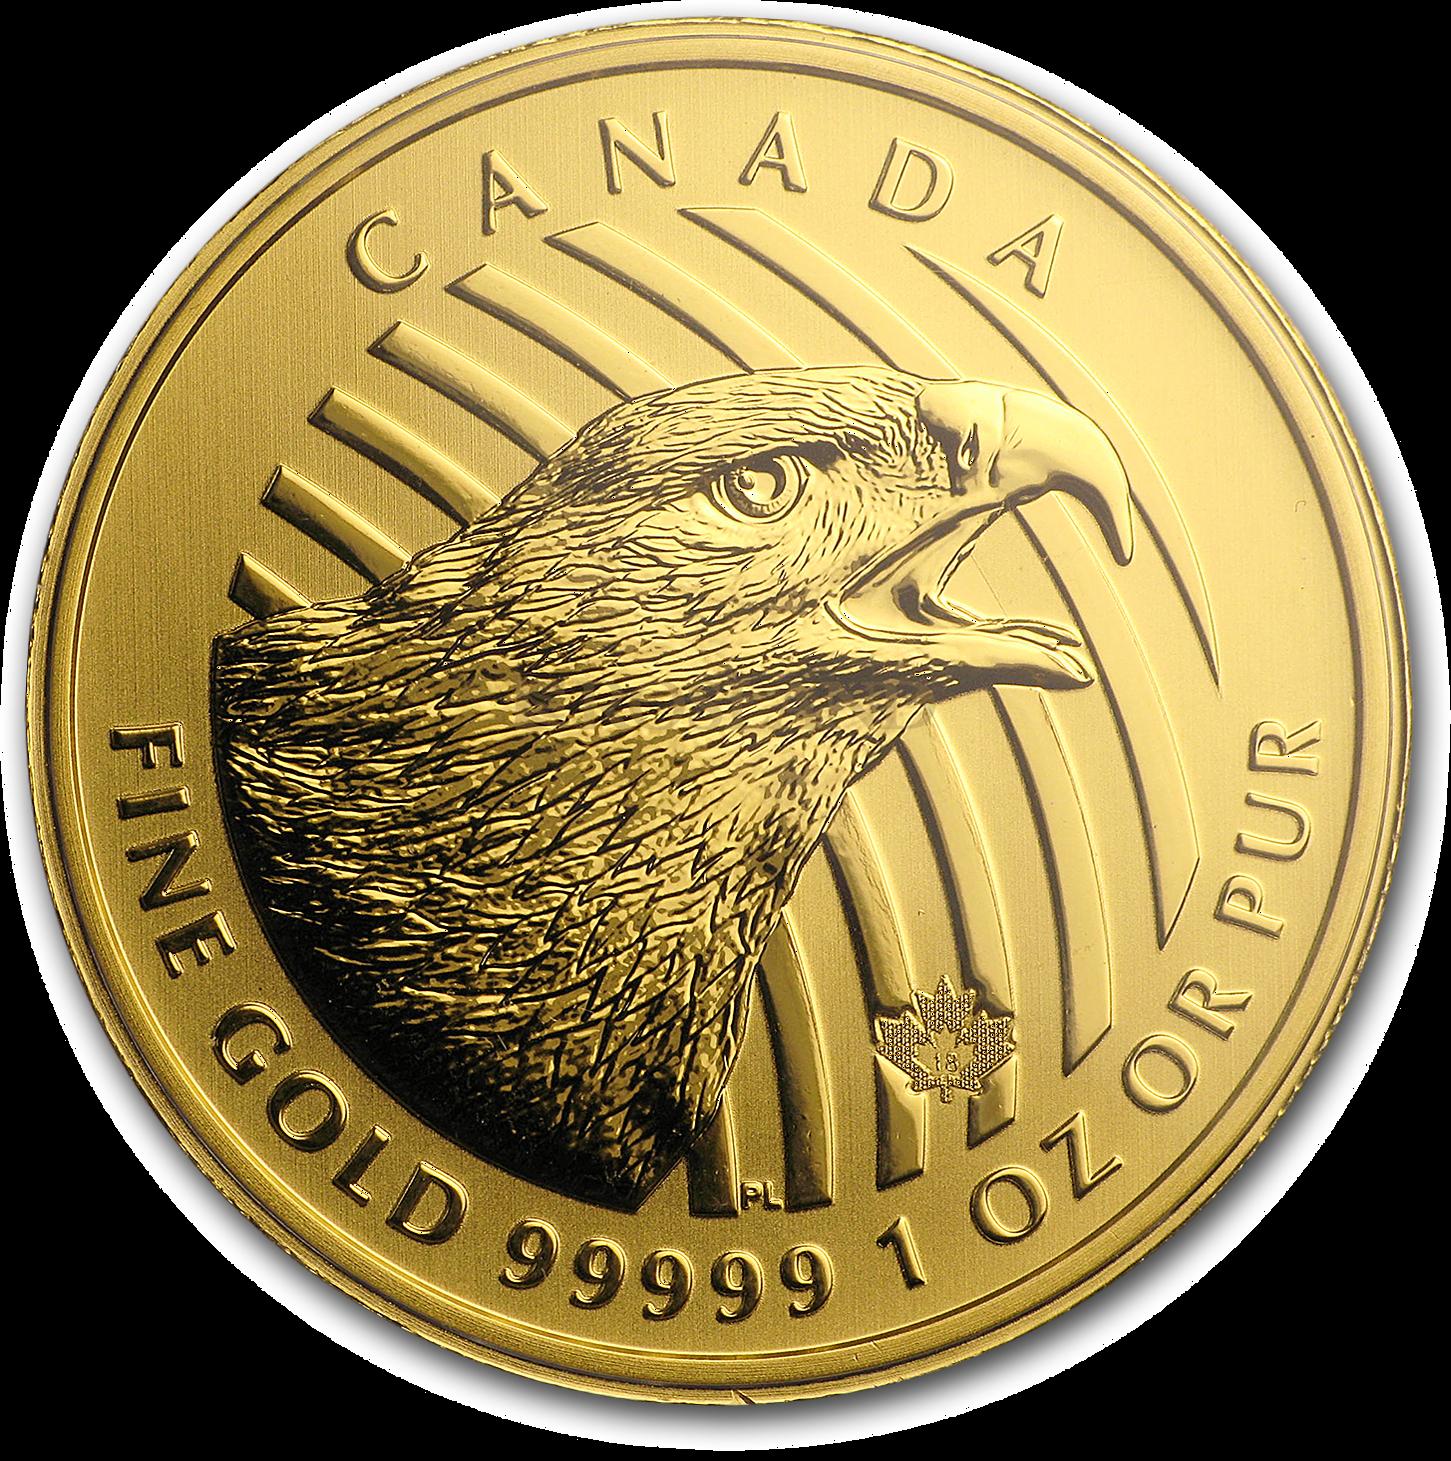 1 Unze Goldmünze Call of the Wild Golden Eagle 2018 (.99999 Gold, Blister)